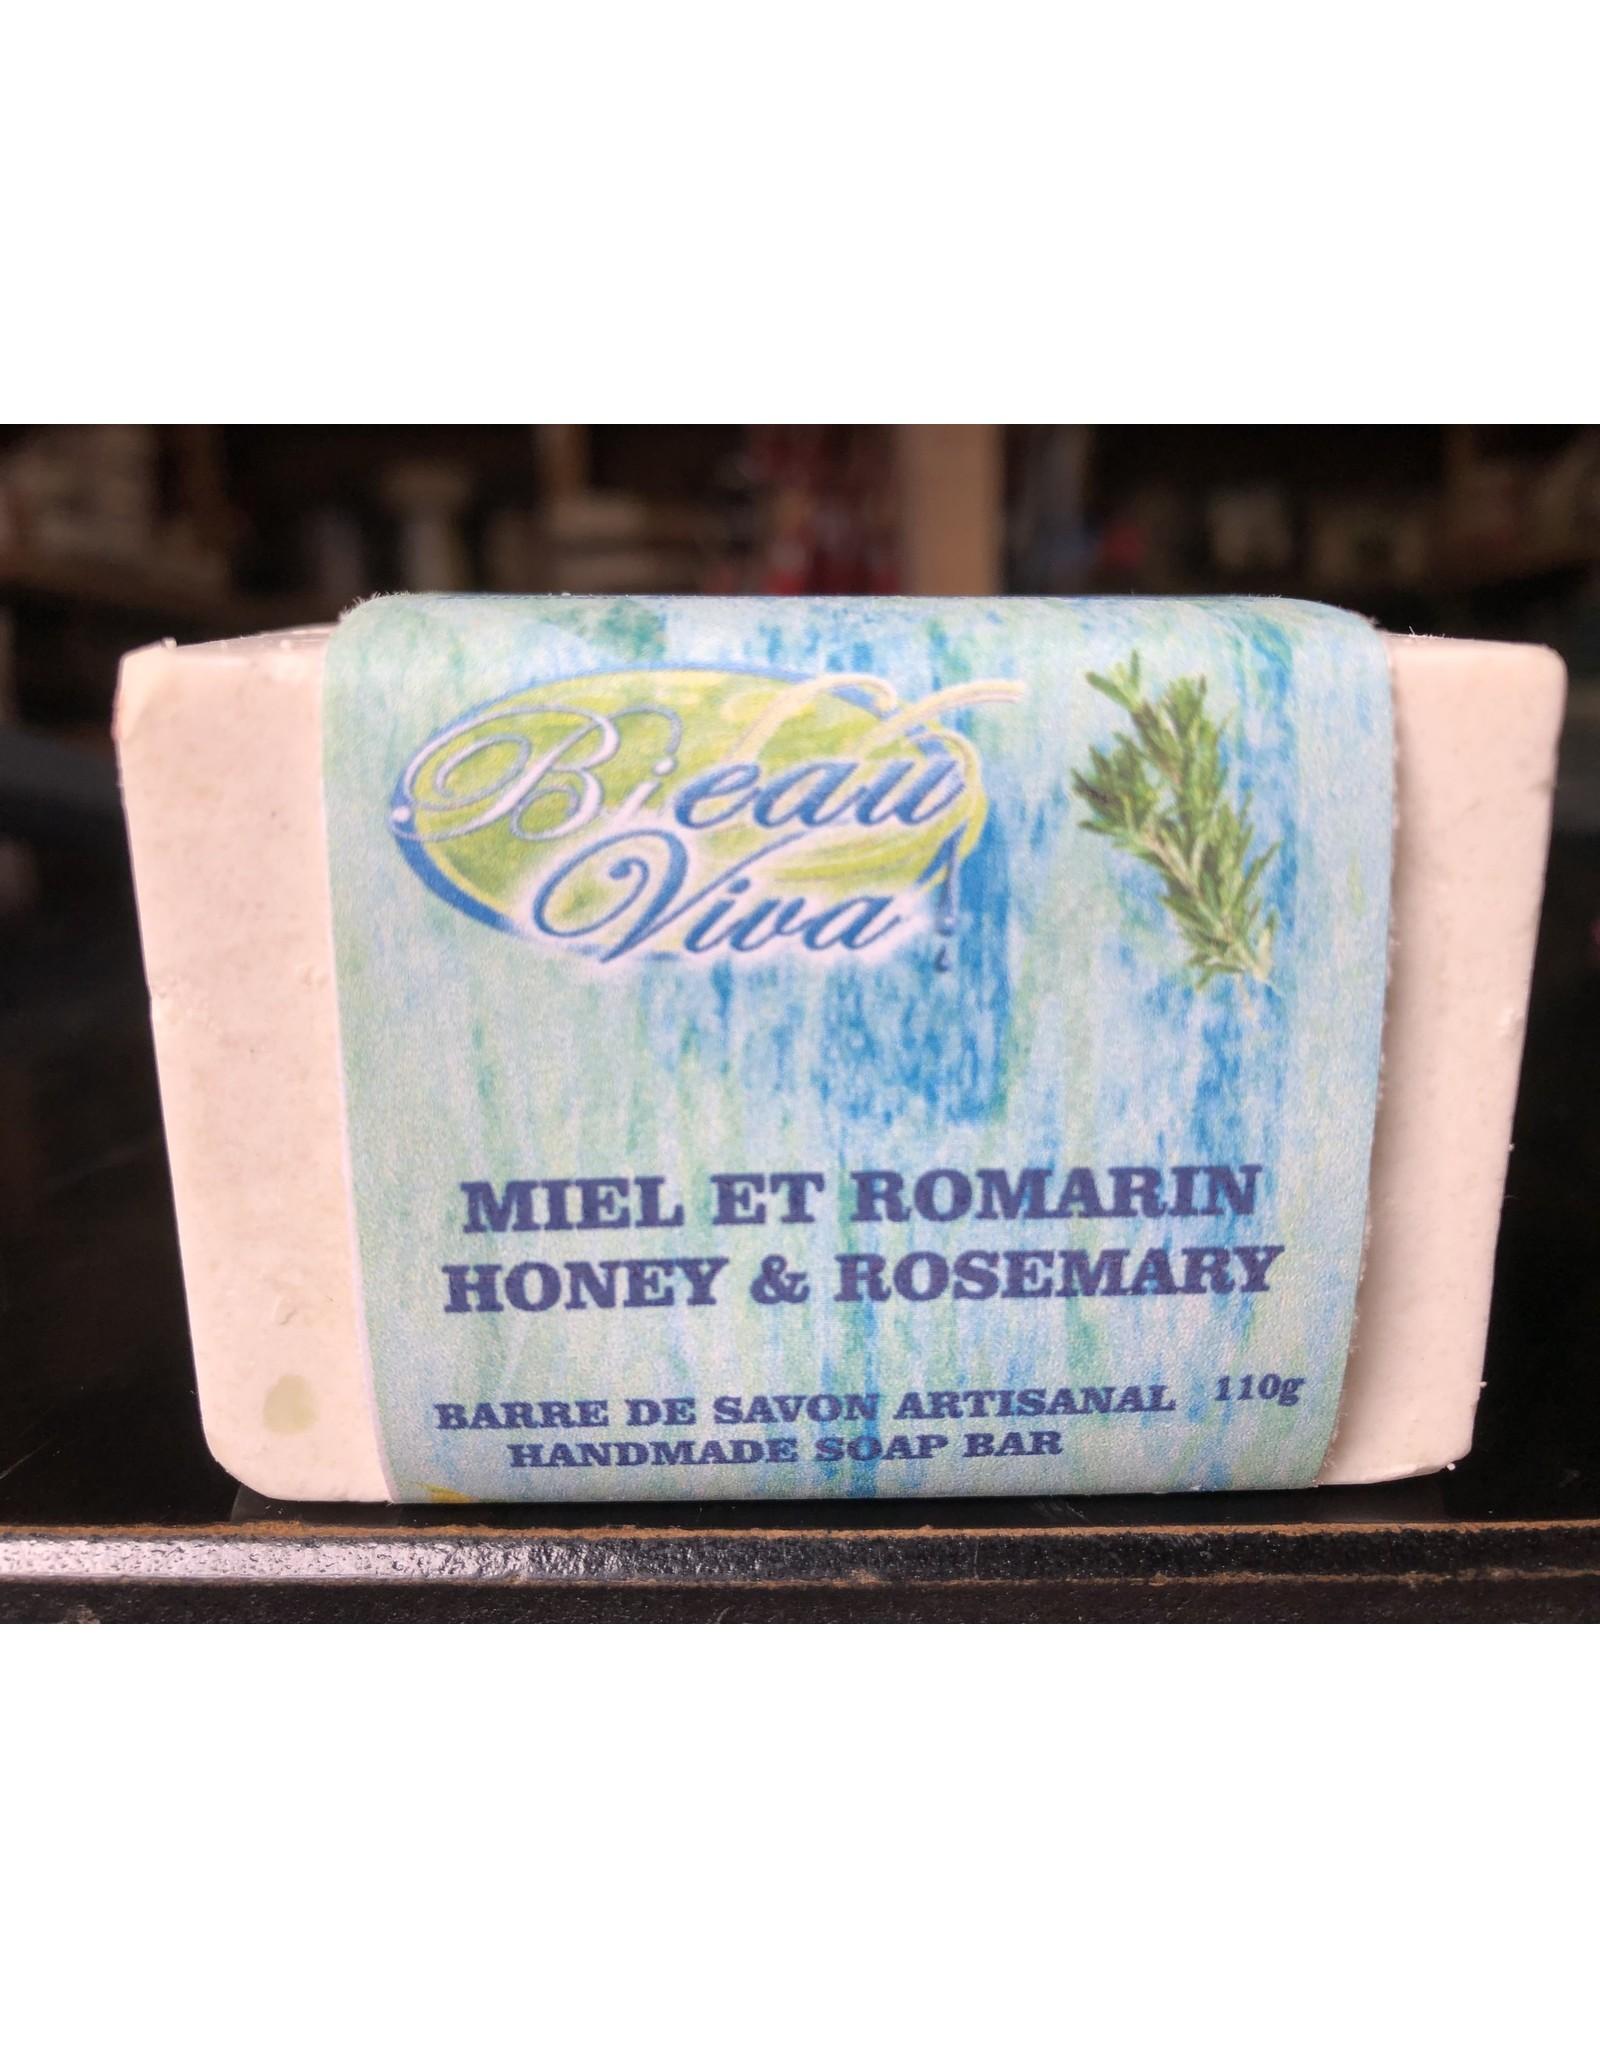 Bieau Viva Savon en barre, miel et Romarin, 110 g